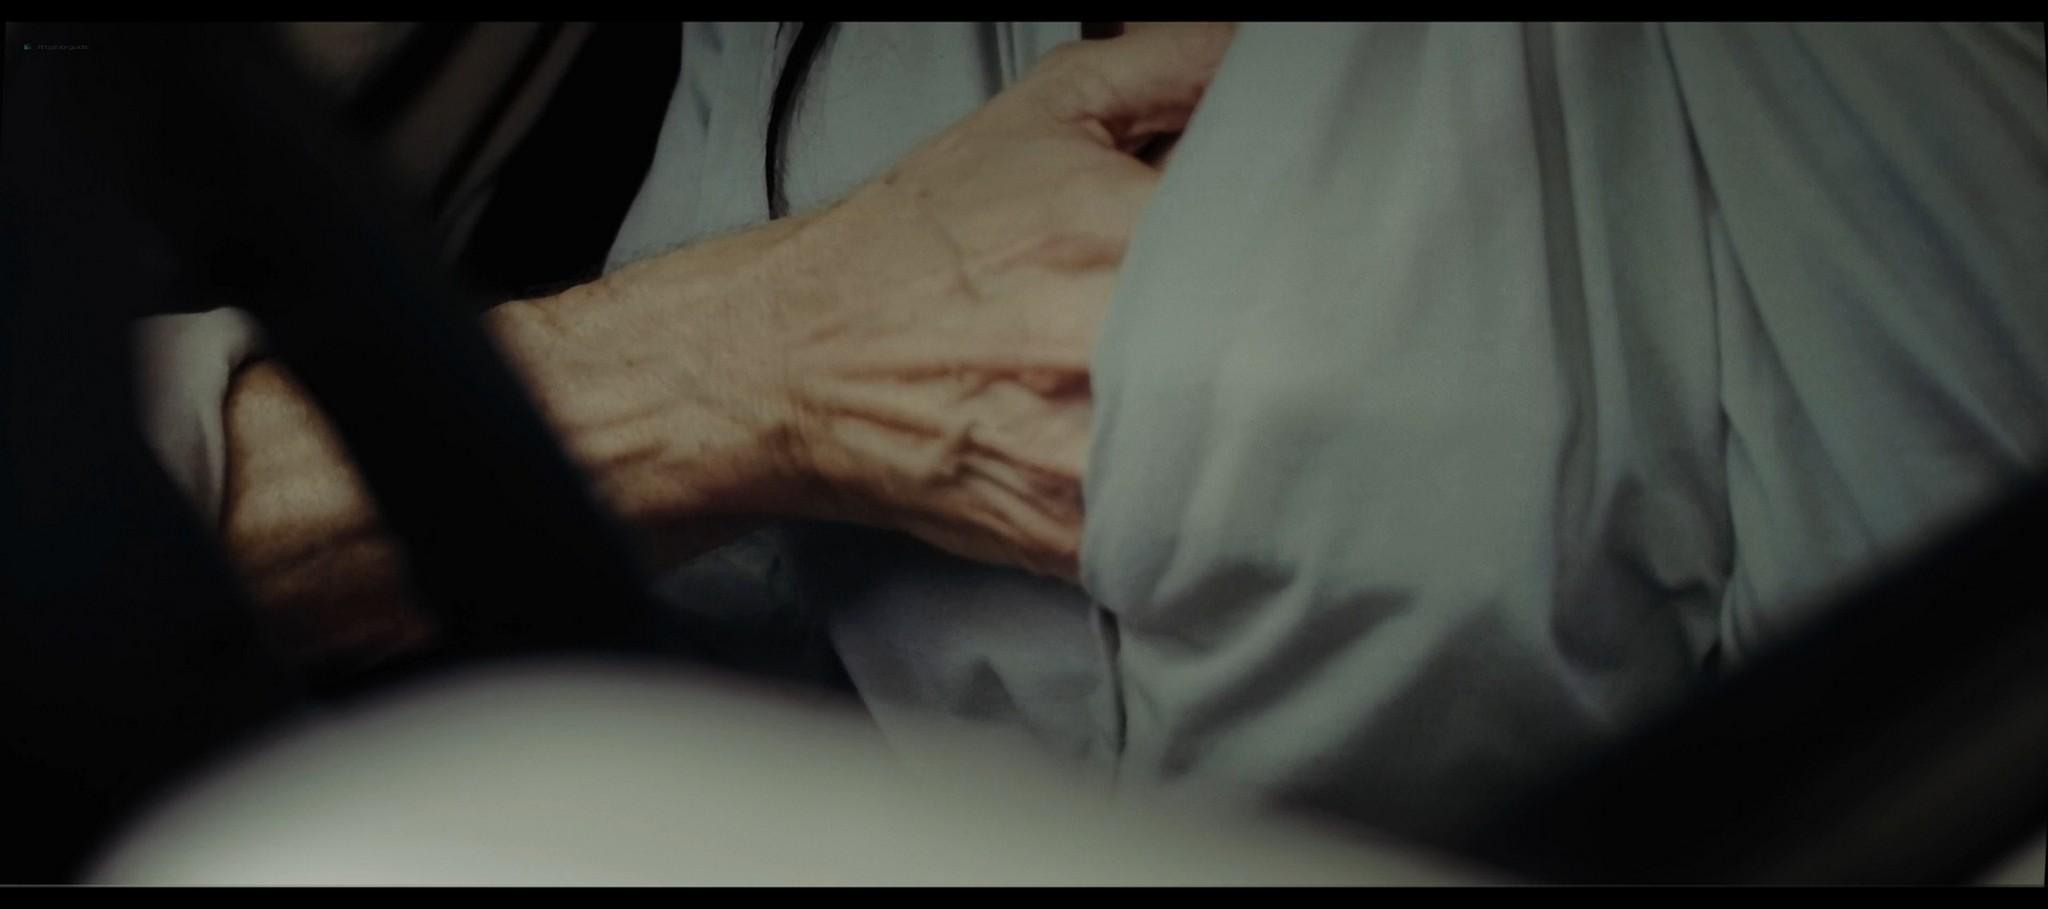 Cristina Chiriac nude full frontal Sofia Rania Dharma Mangia Woods full frontal too Tommaso 2019 HD 1080p Bluray 015